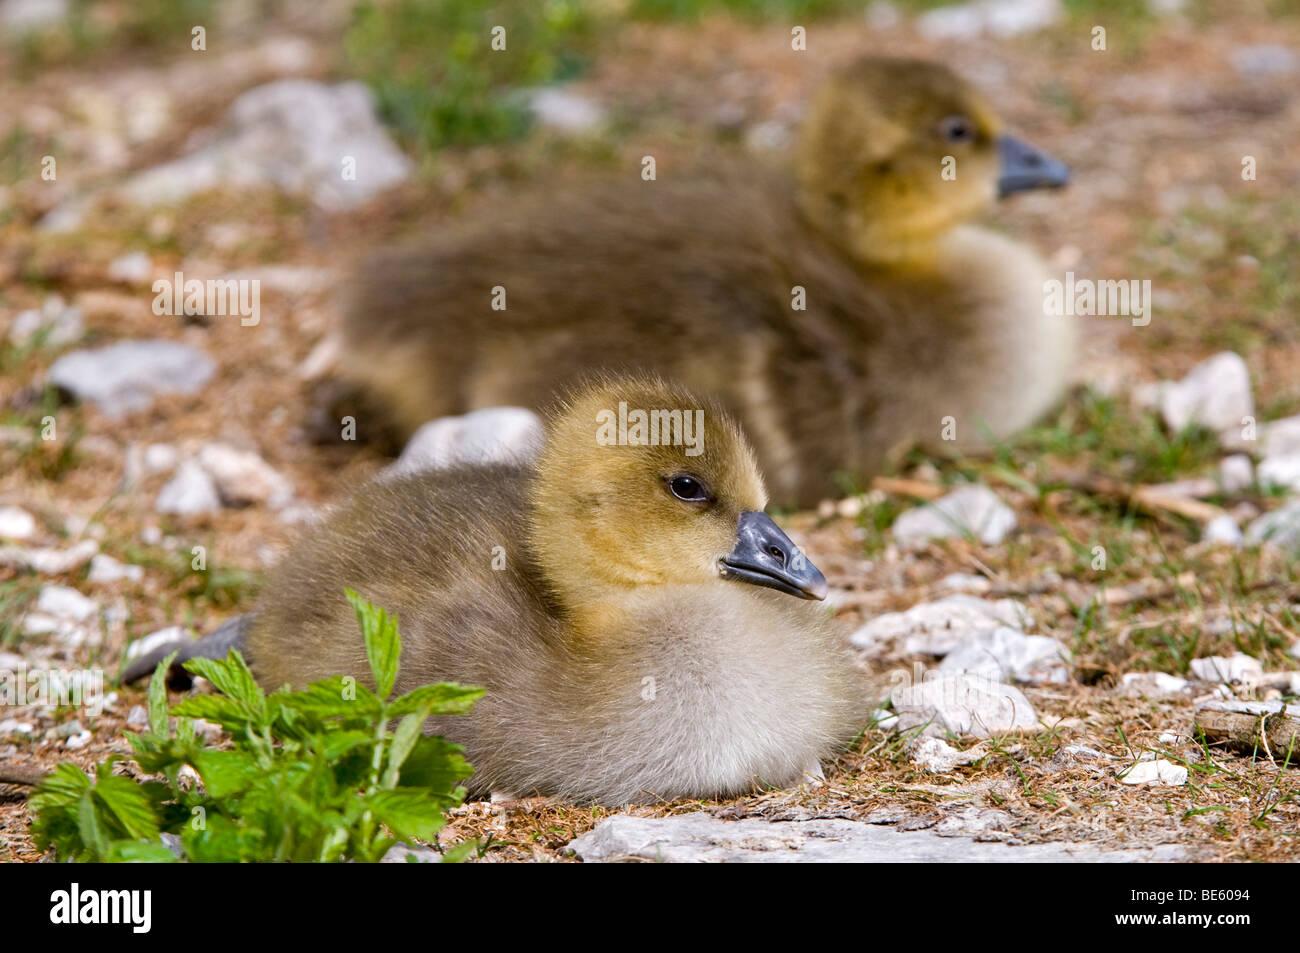 Two Greylag Geese (Anser anser), fledglings - Stock Image